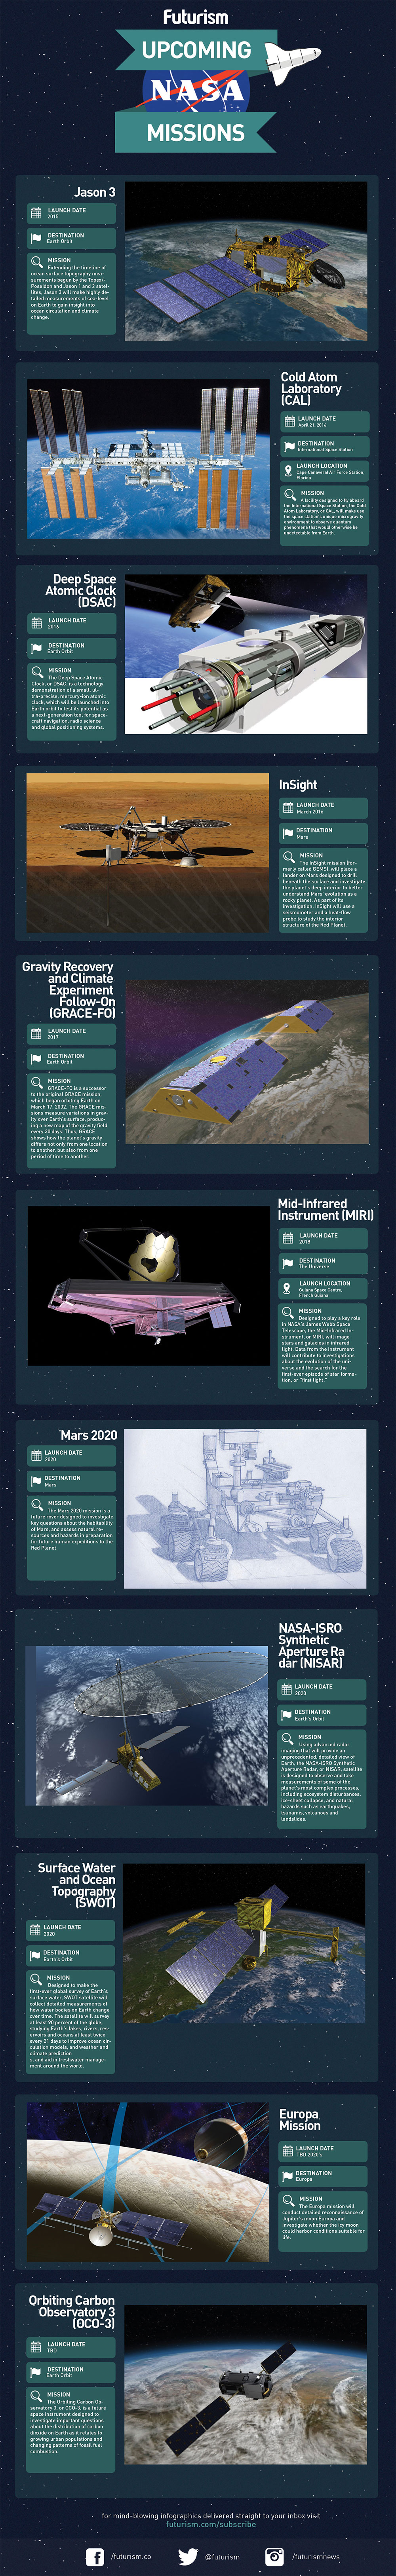 Infographic Upcoming NASA Missions